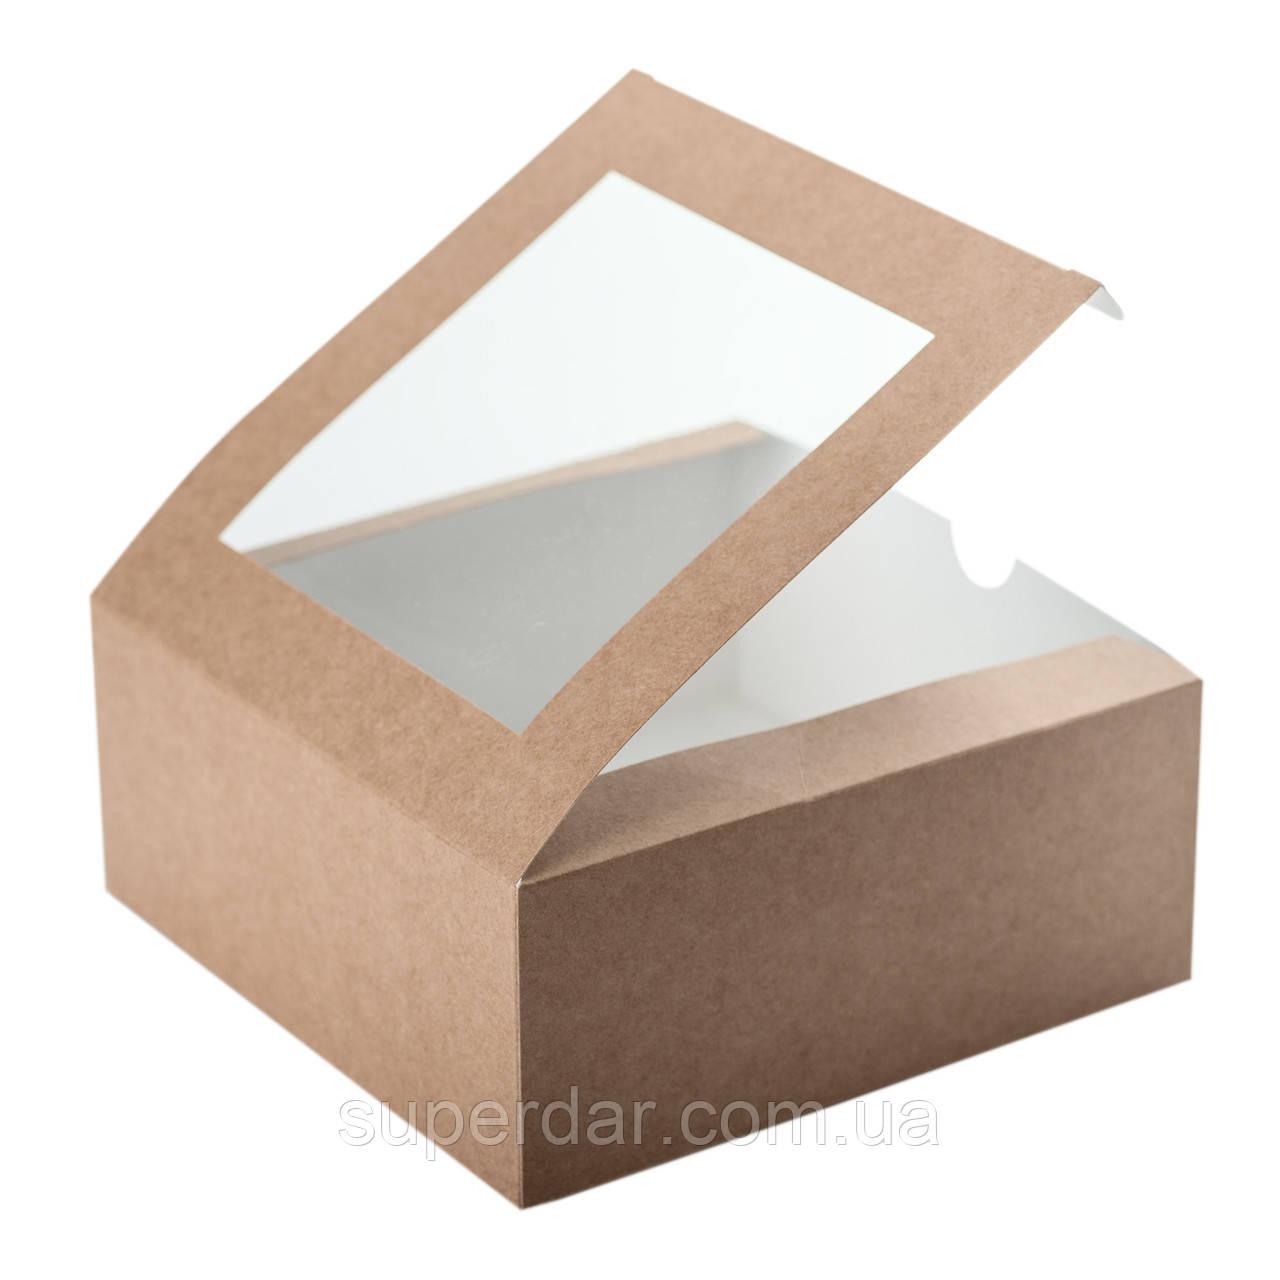 Коробка для 4 капкейков 165х165х70 мм., с окошком и со вставкой, крафт